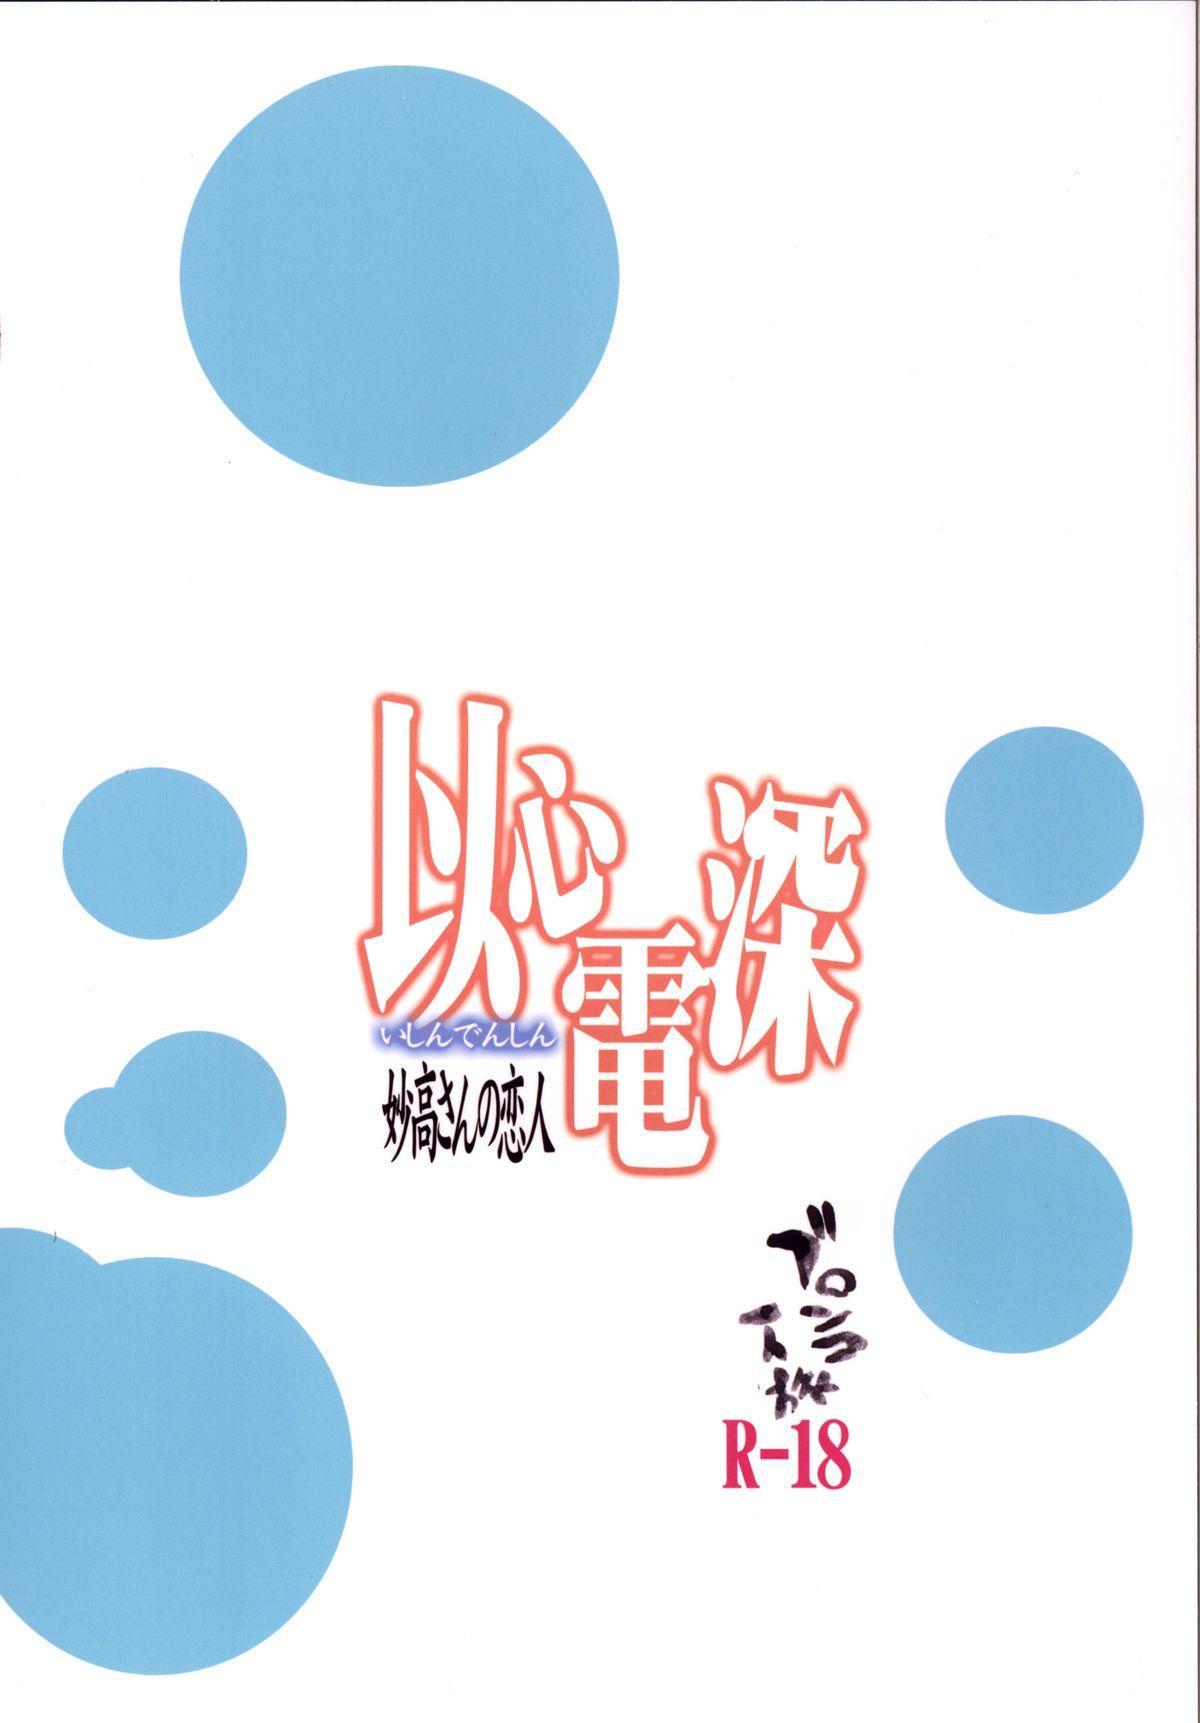 [Bronco Hitoritabi (Uchi-Uchi Keyaki)] Ishin Denshin Myoukou-san no Koibito | From Heart to Heart - Myoukou san's Love (Kantai Collection -KanColle-) [English] [Bigbigfool] [Digital] [Incomplete] 22